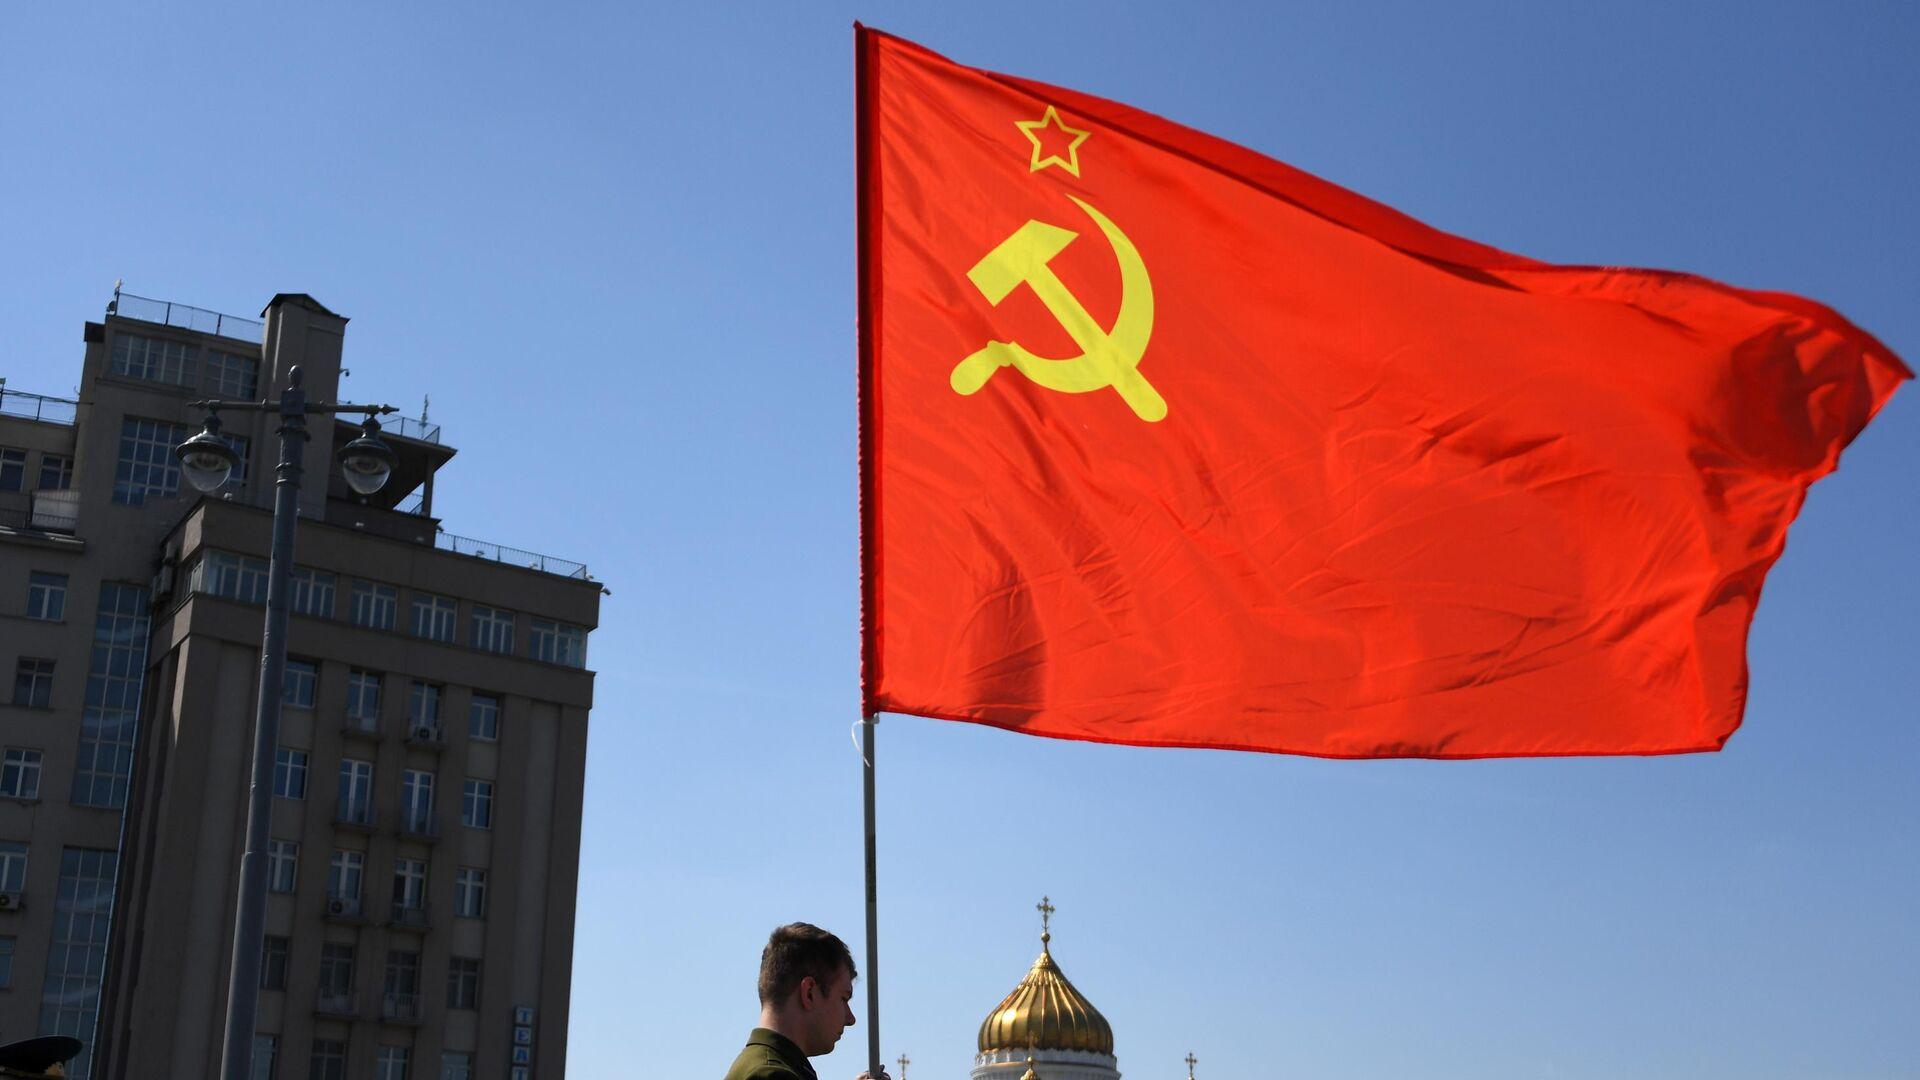 Флаг СССР - РИА Новости, 1920, 09.05.2021